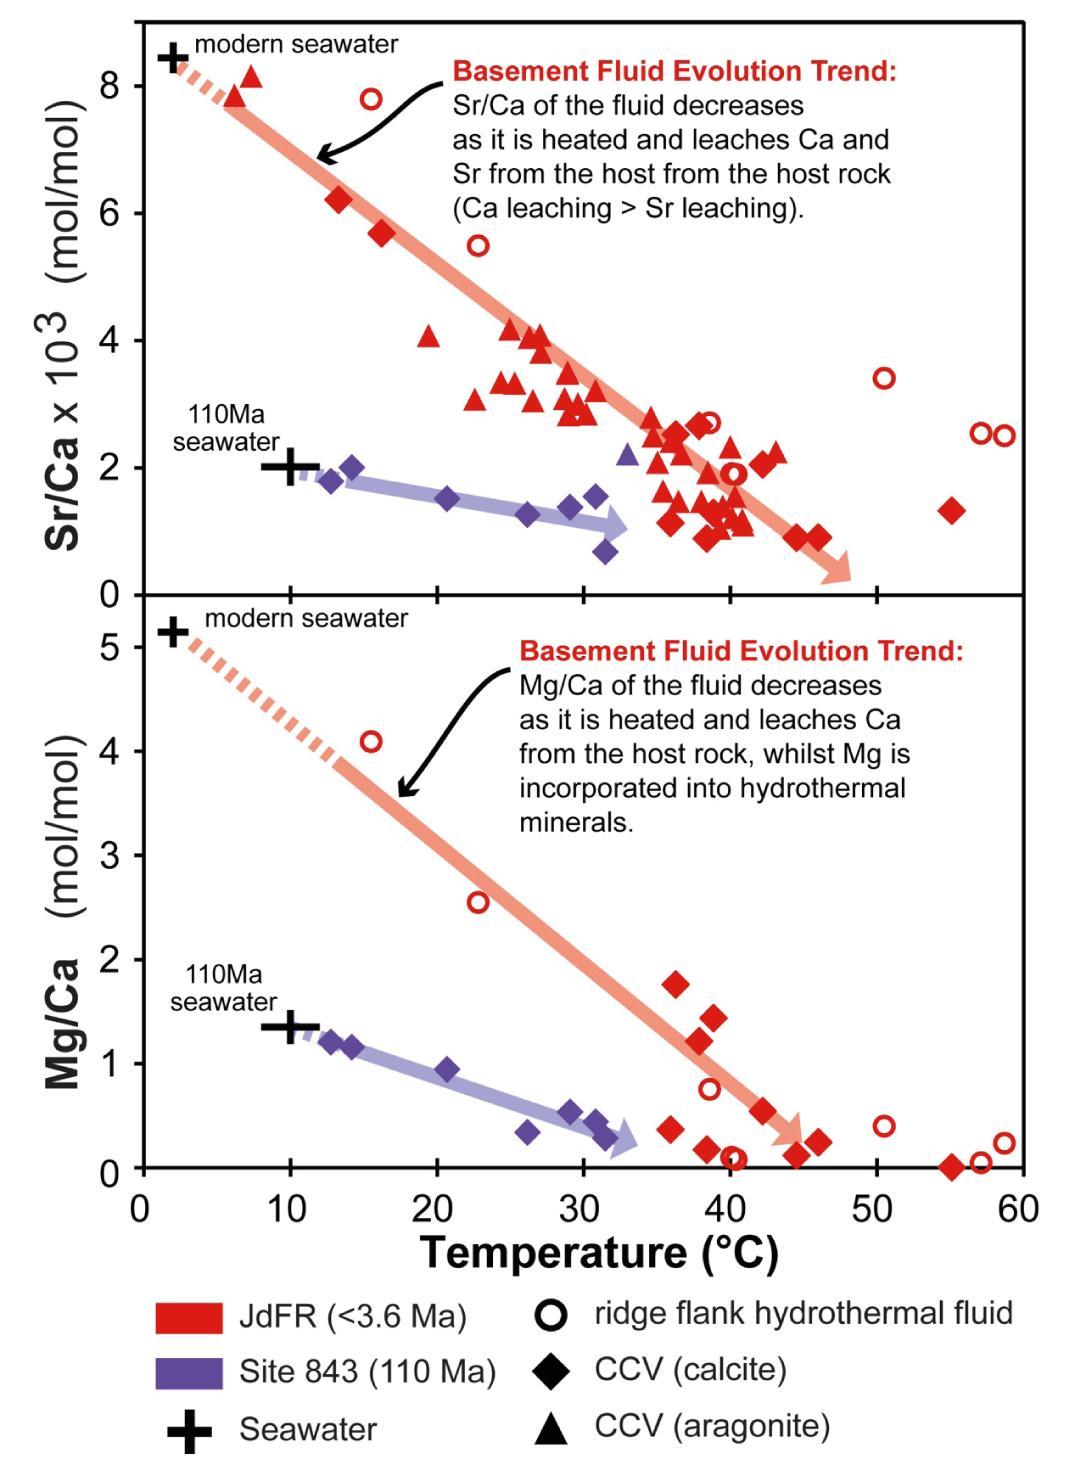 calcium carbonate veins as past recorders of past ocean chemistry